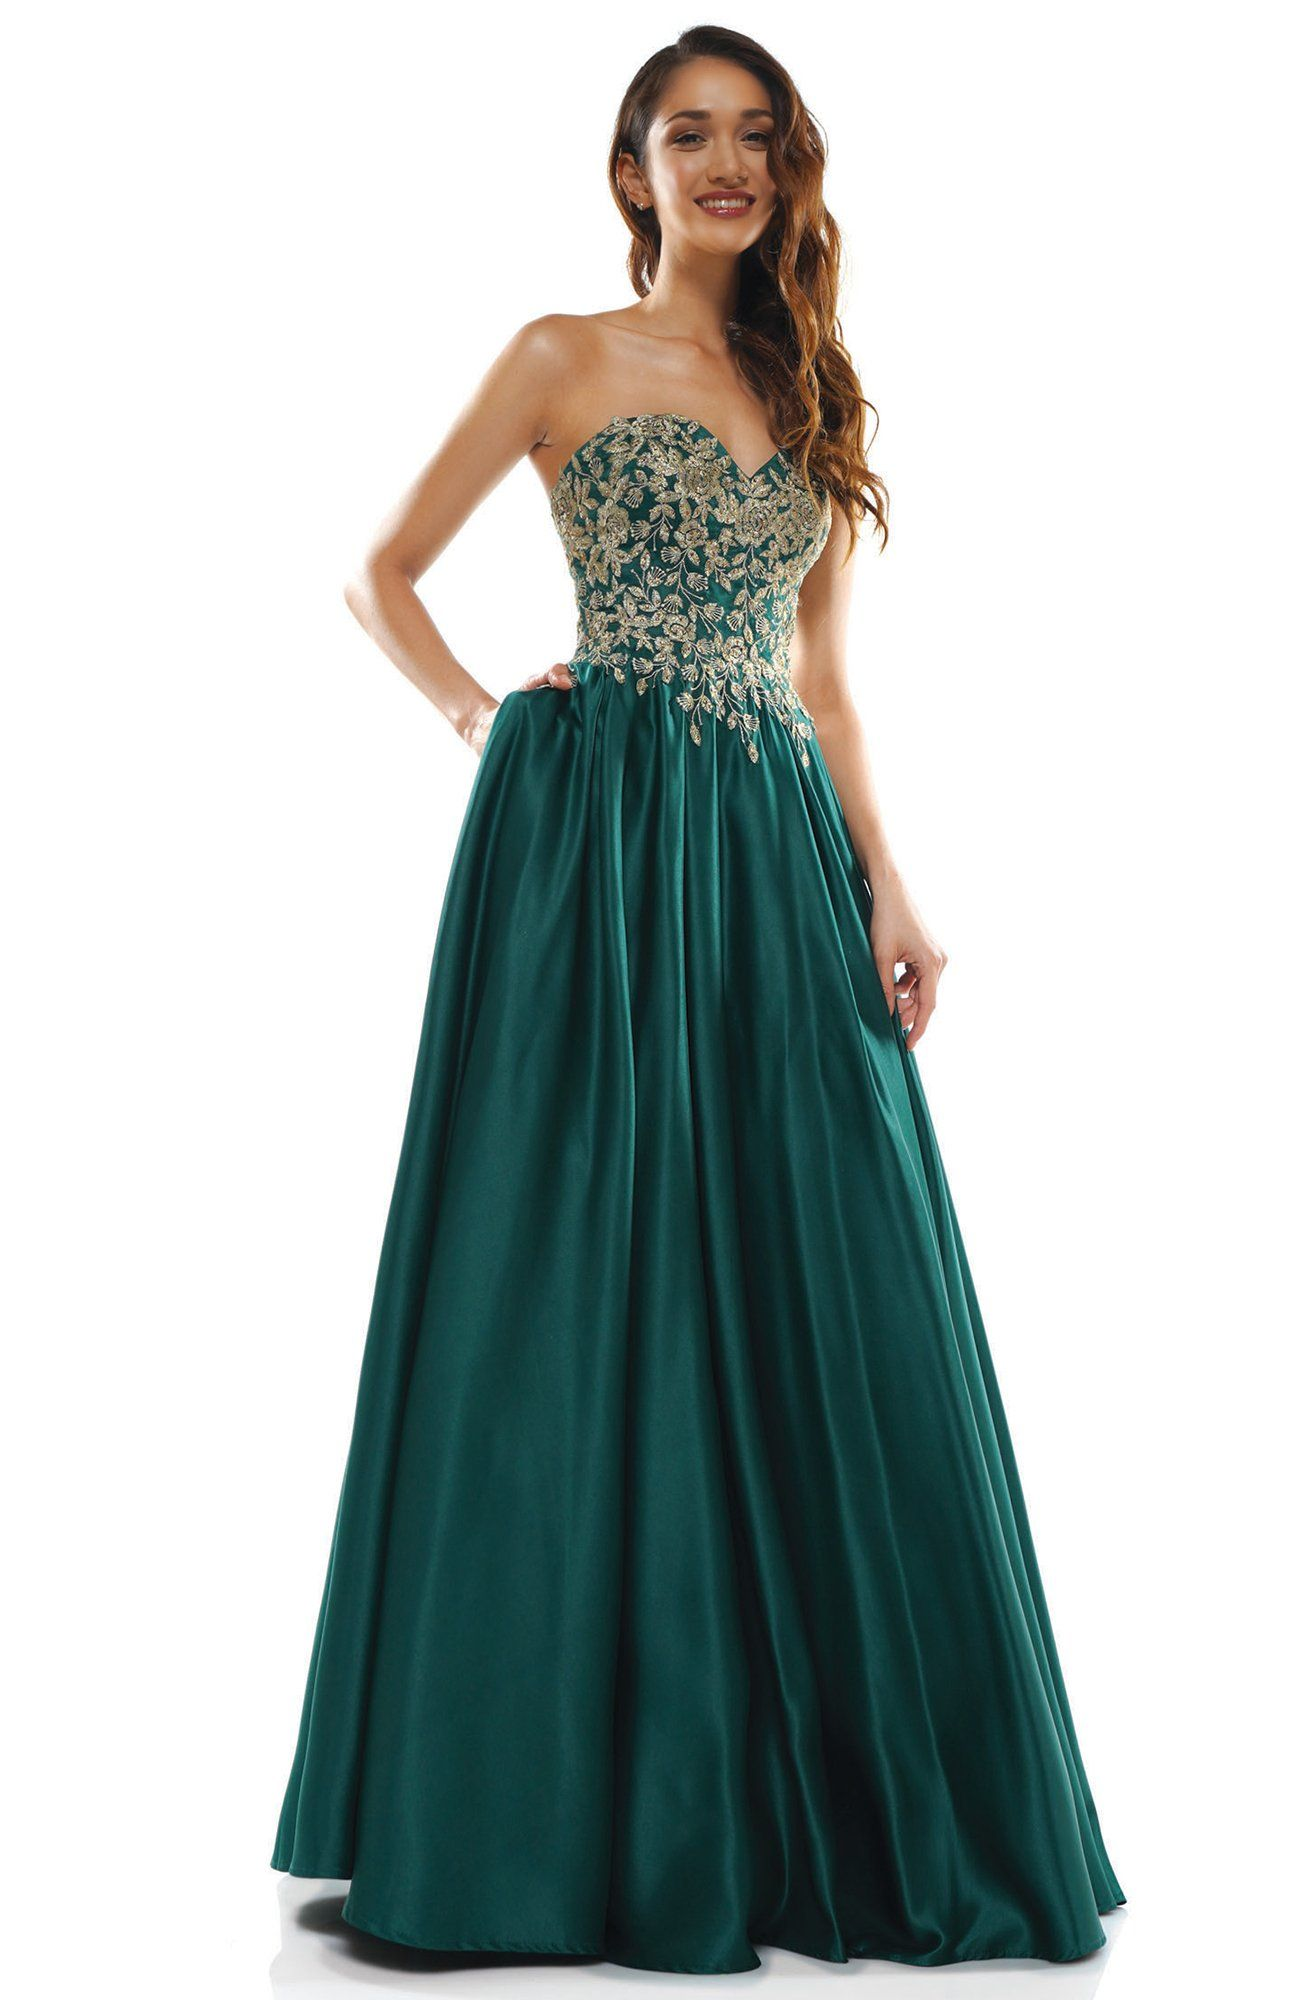 Glow Dress G897 Strapless Long A Line Dress In 2021 Emerald Green Prom Dress Dresses Strapless Prom Dresses [ 2000 x 1314 Pixel ]